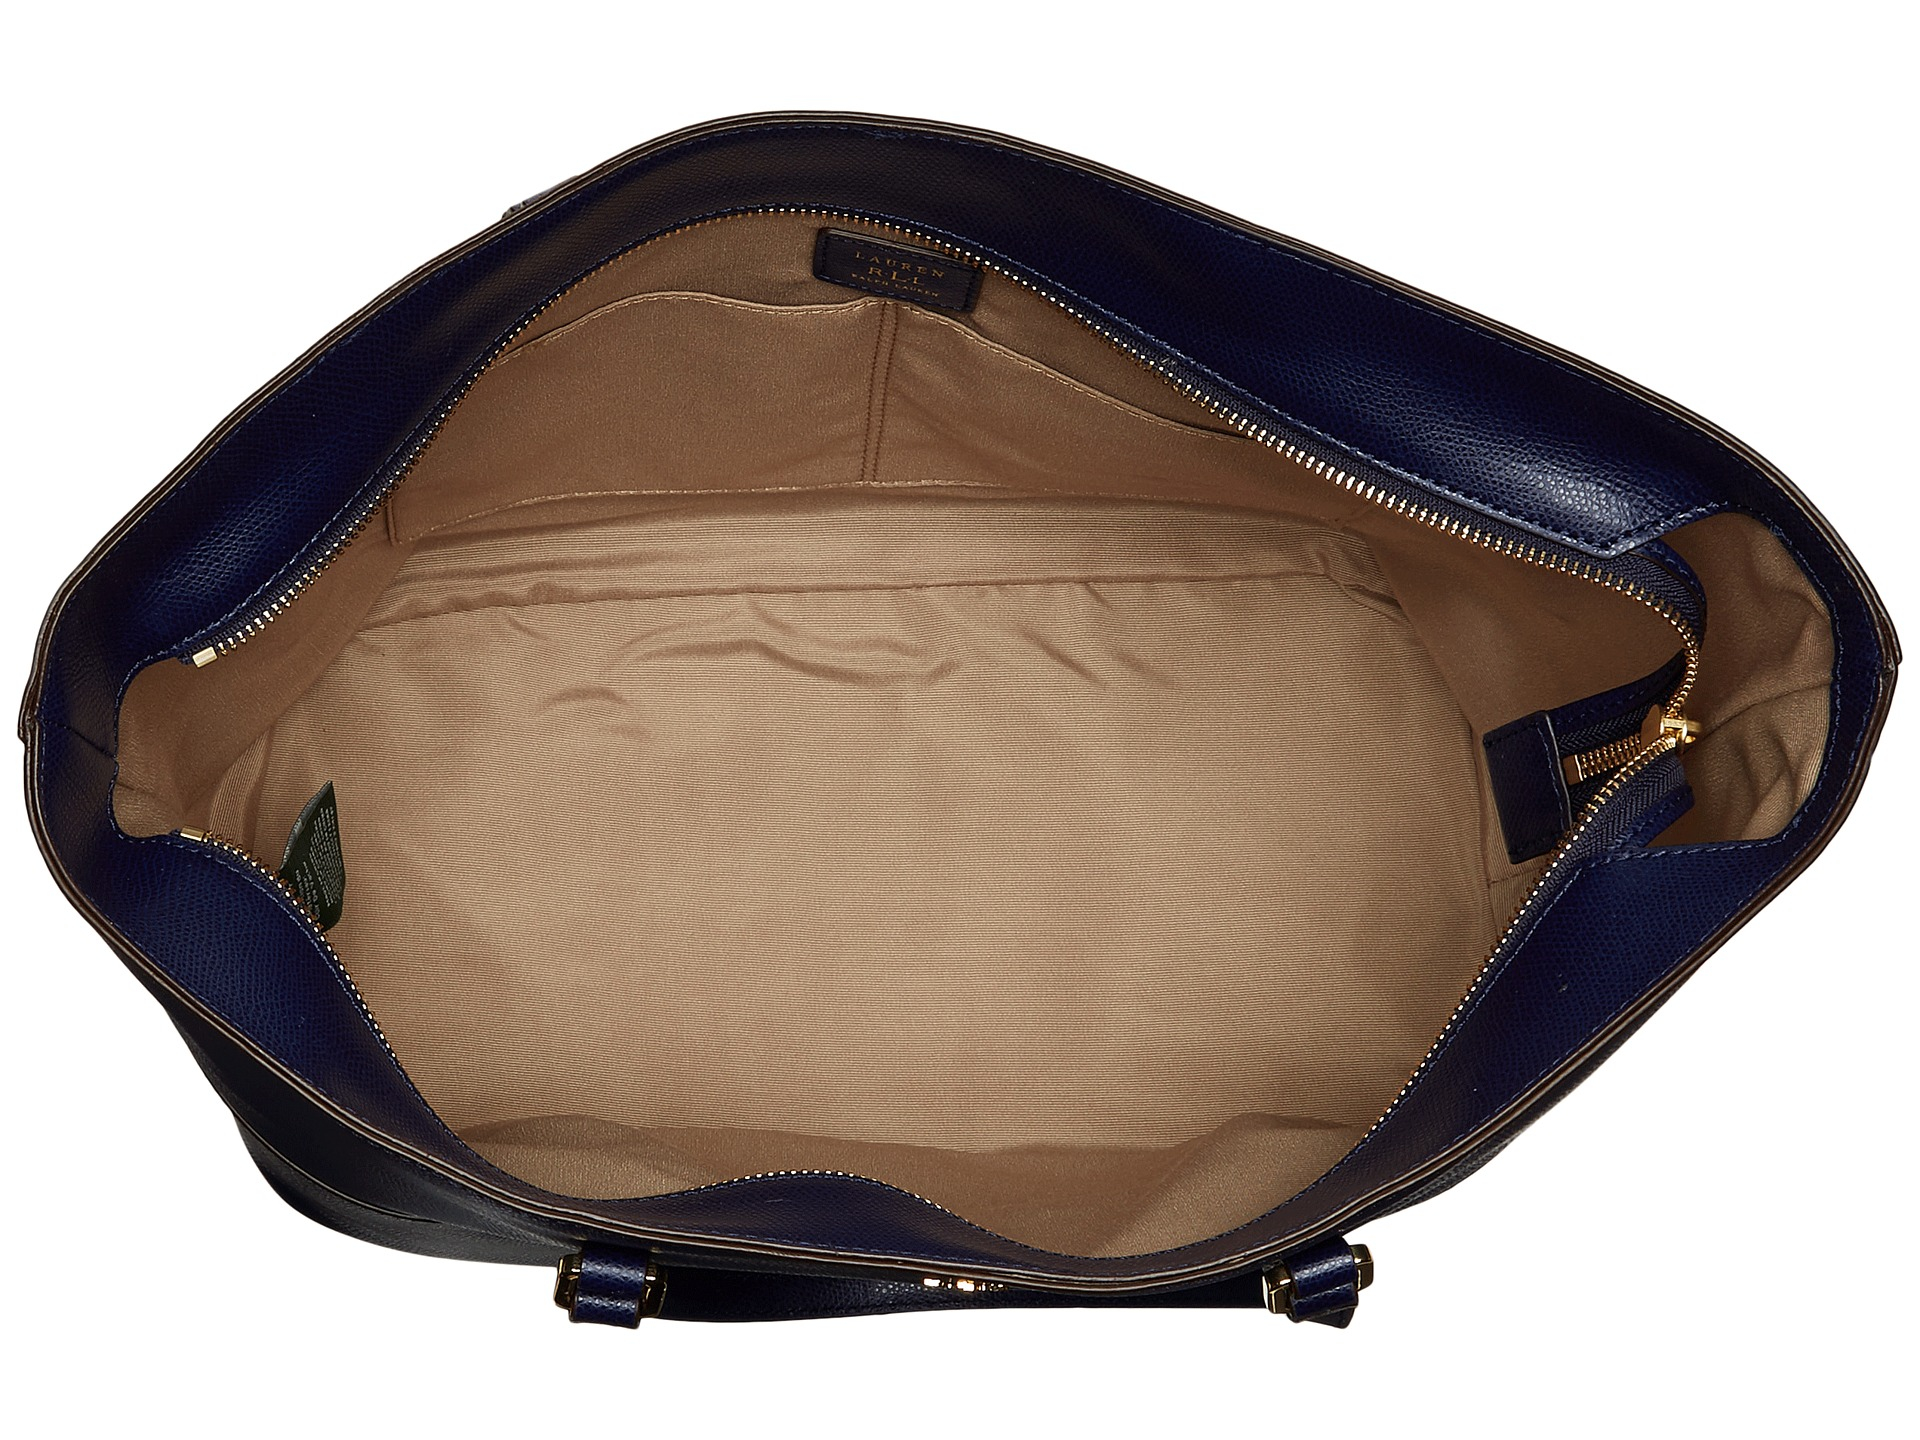 1031e85bcb ... buy lyst lauren by ralph lauren whitby pocket tote in blue 951b1 b5338